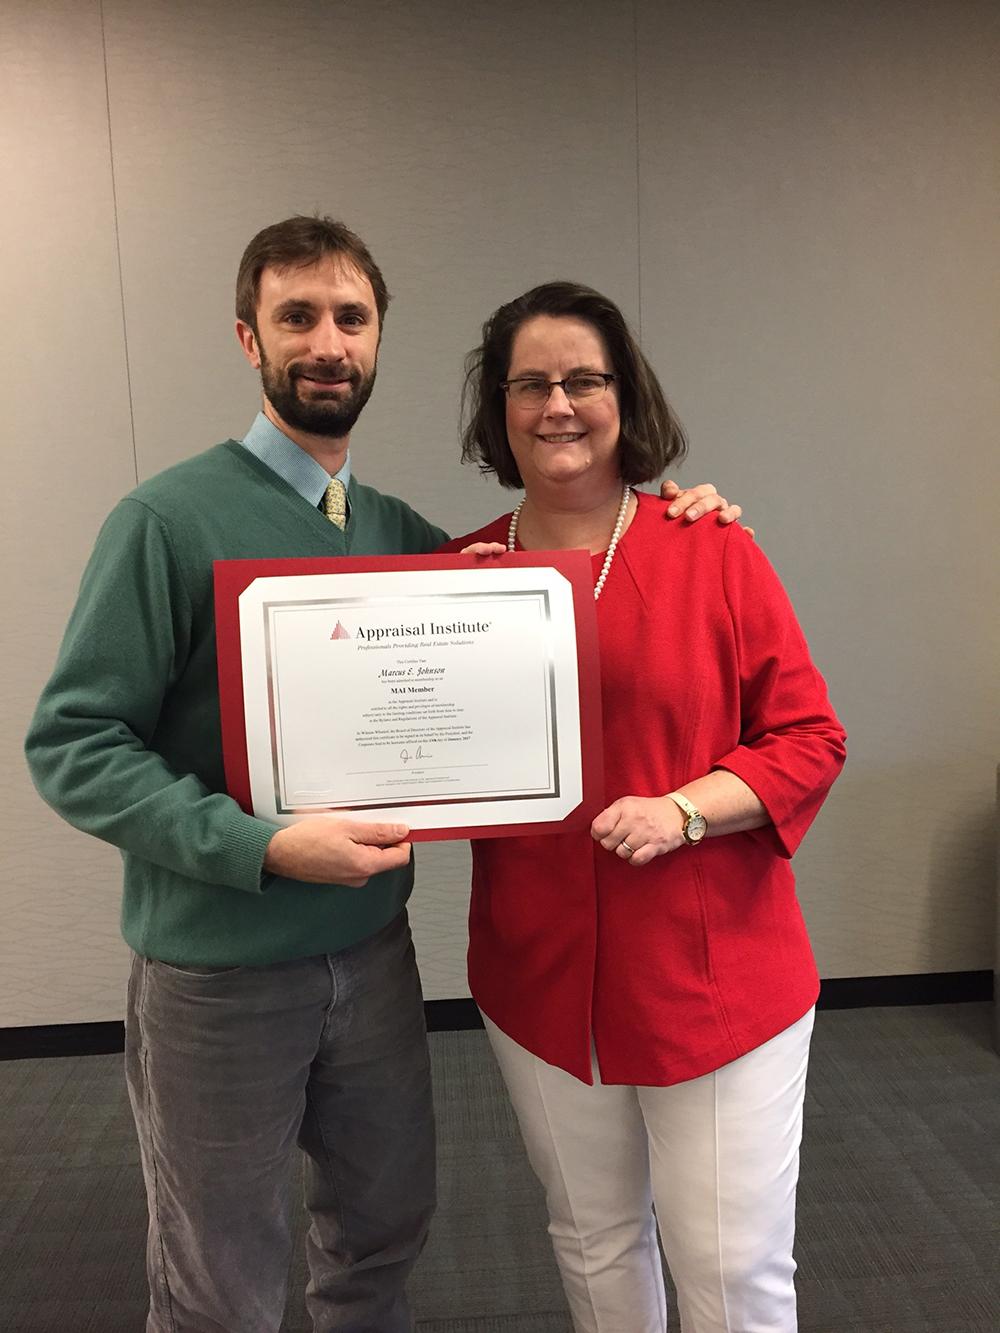 Johnson Of The Appraisers Group Awarded Mai Designation Nerej